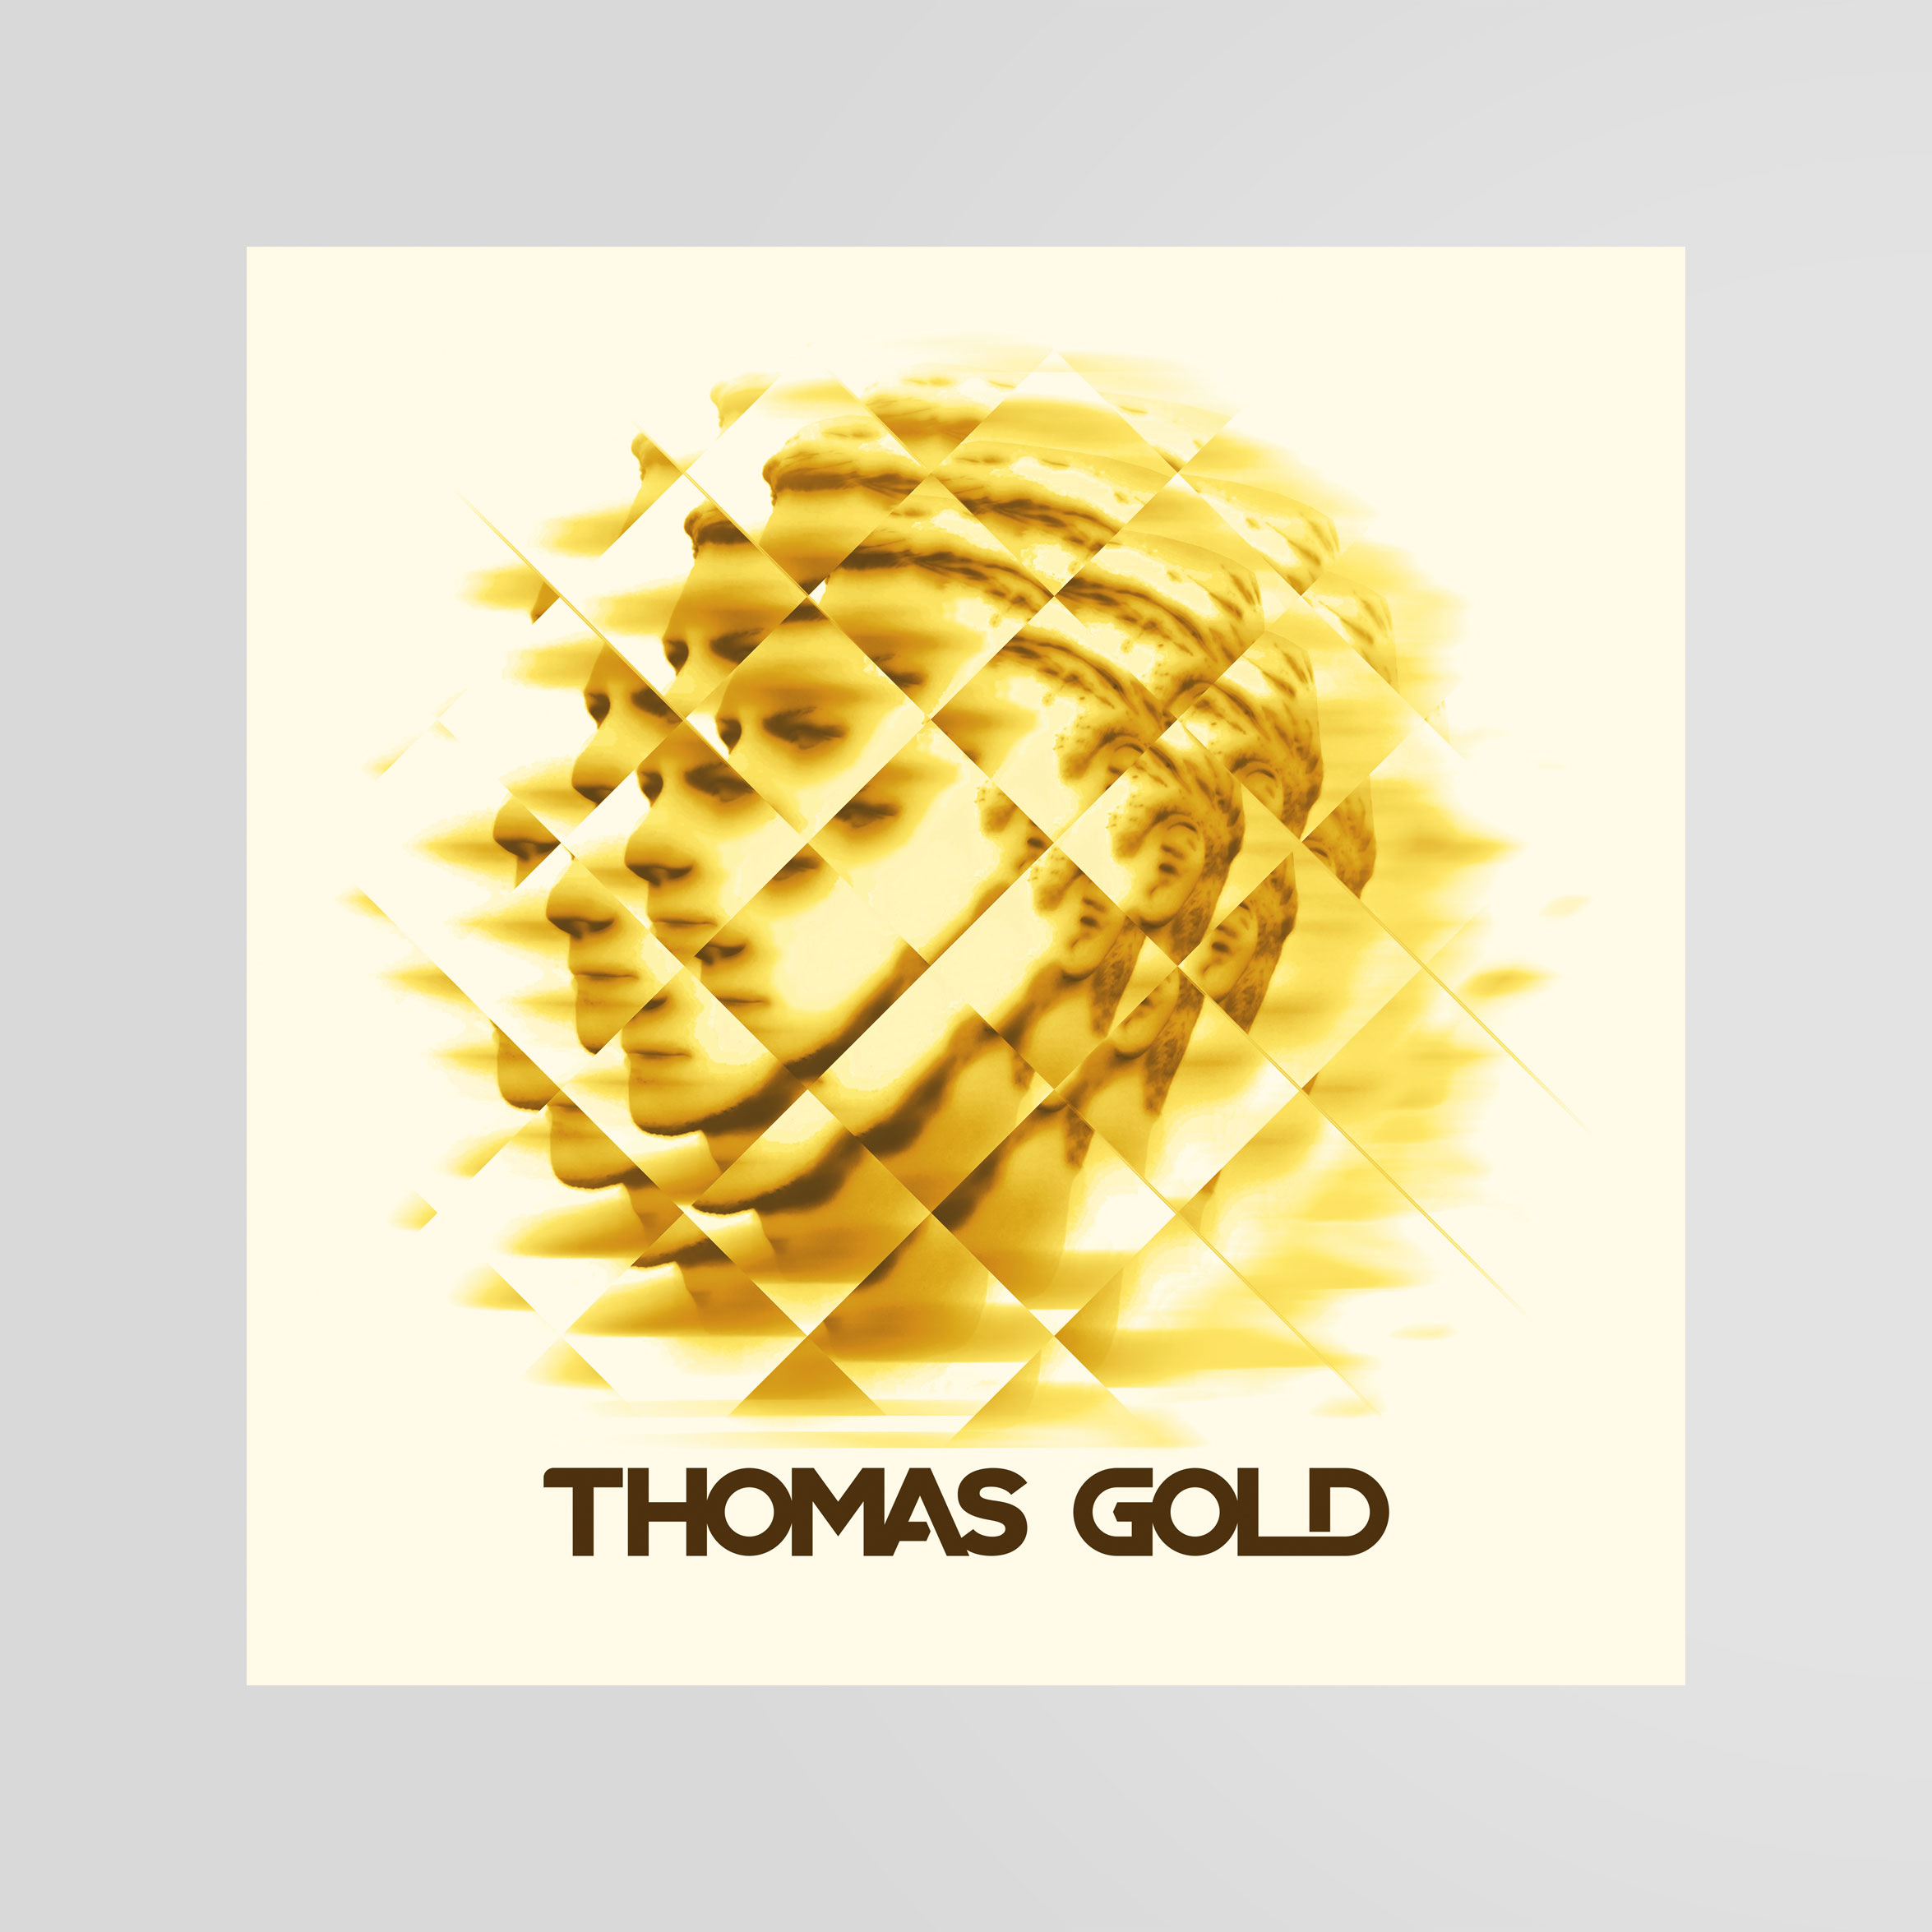 08-ThomasGoldDBSTF-02a